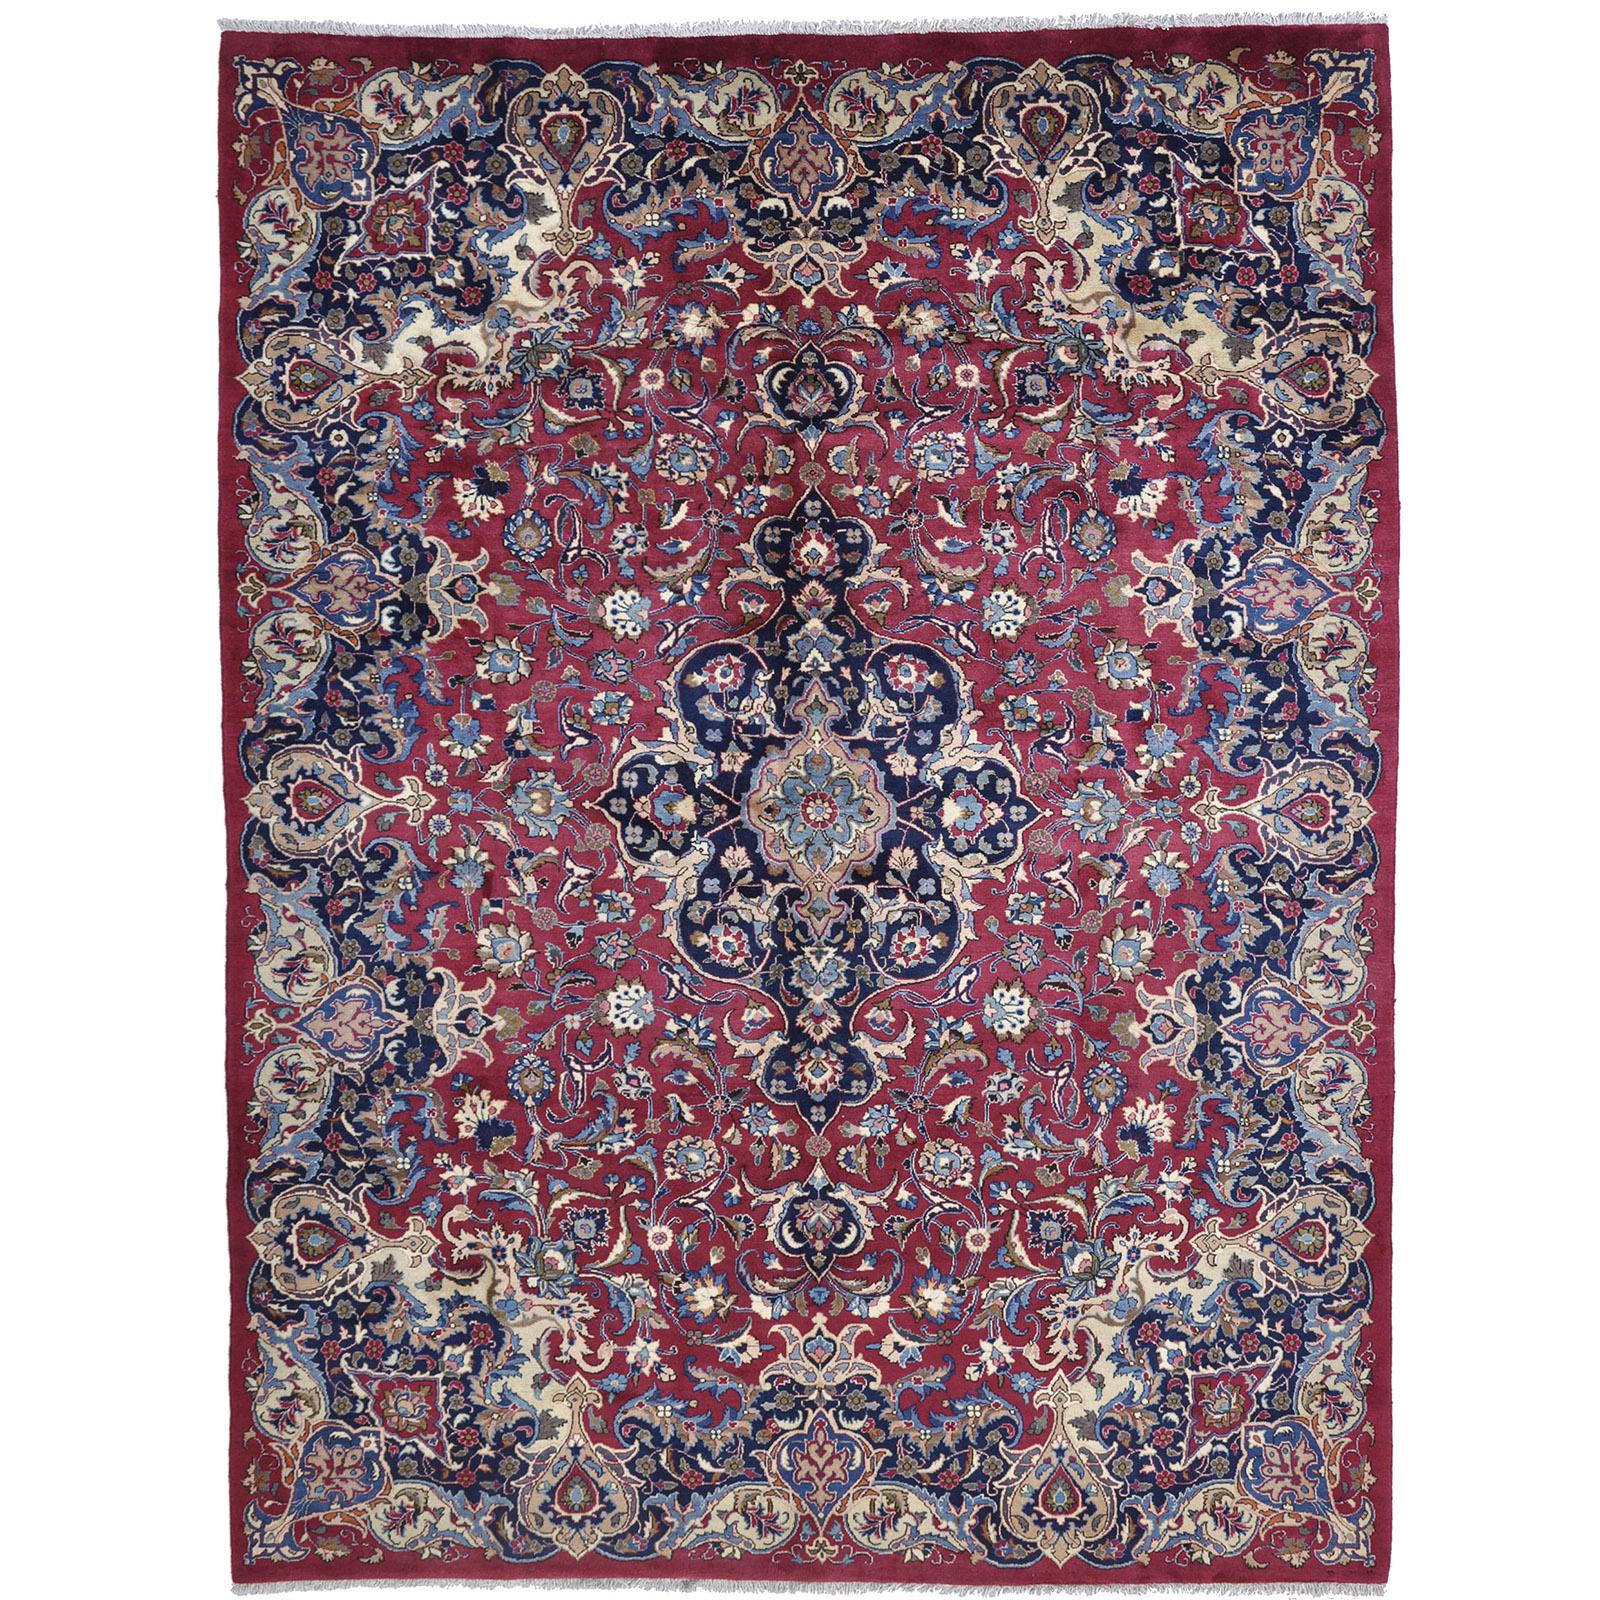 Mashad matta storlek 330x244 cm